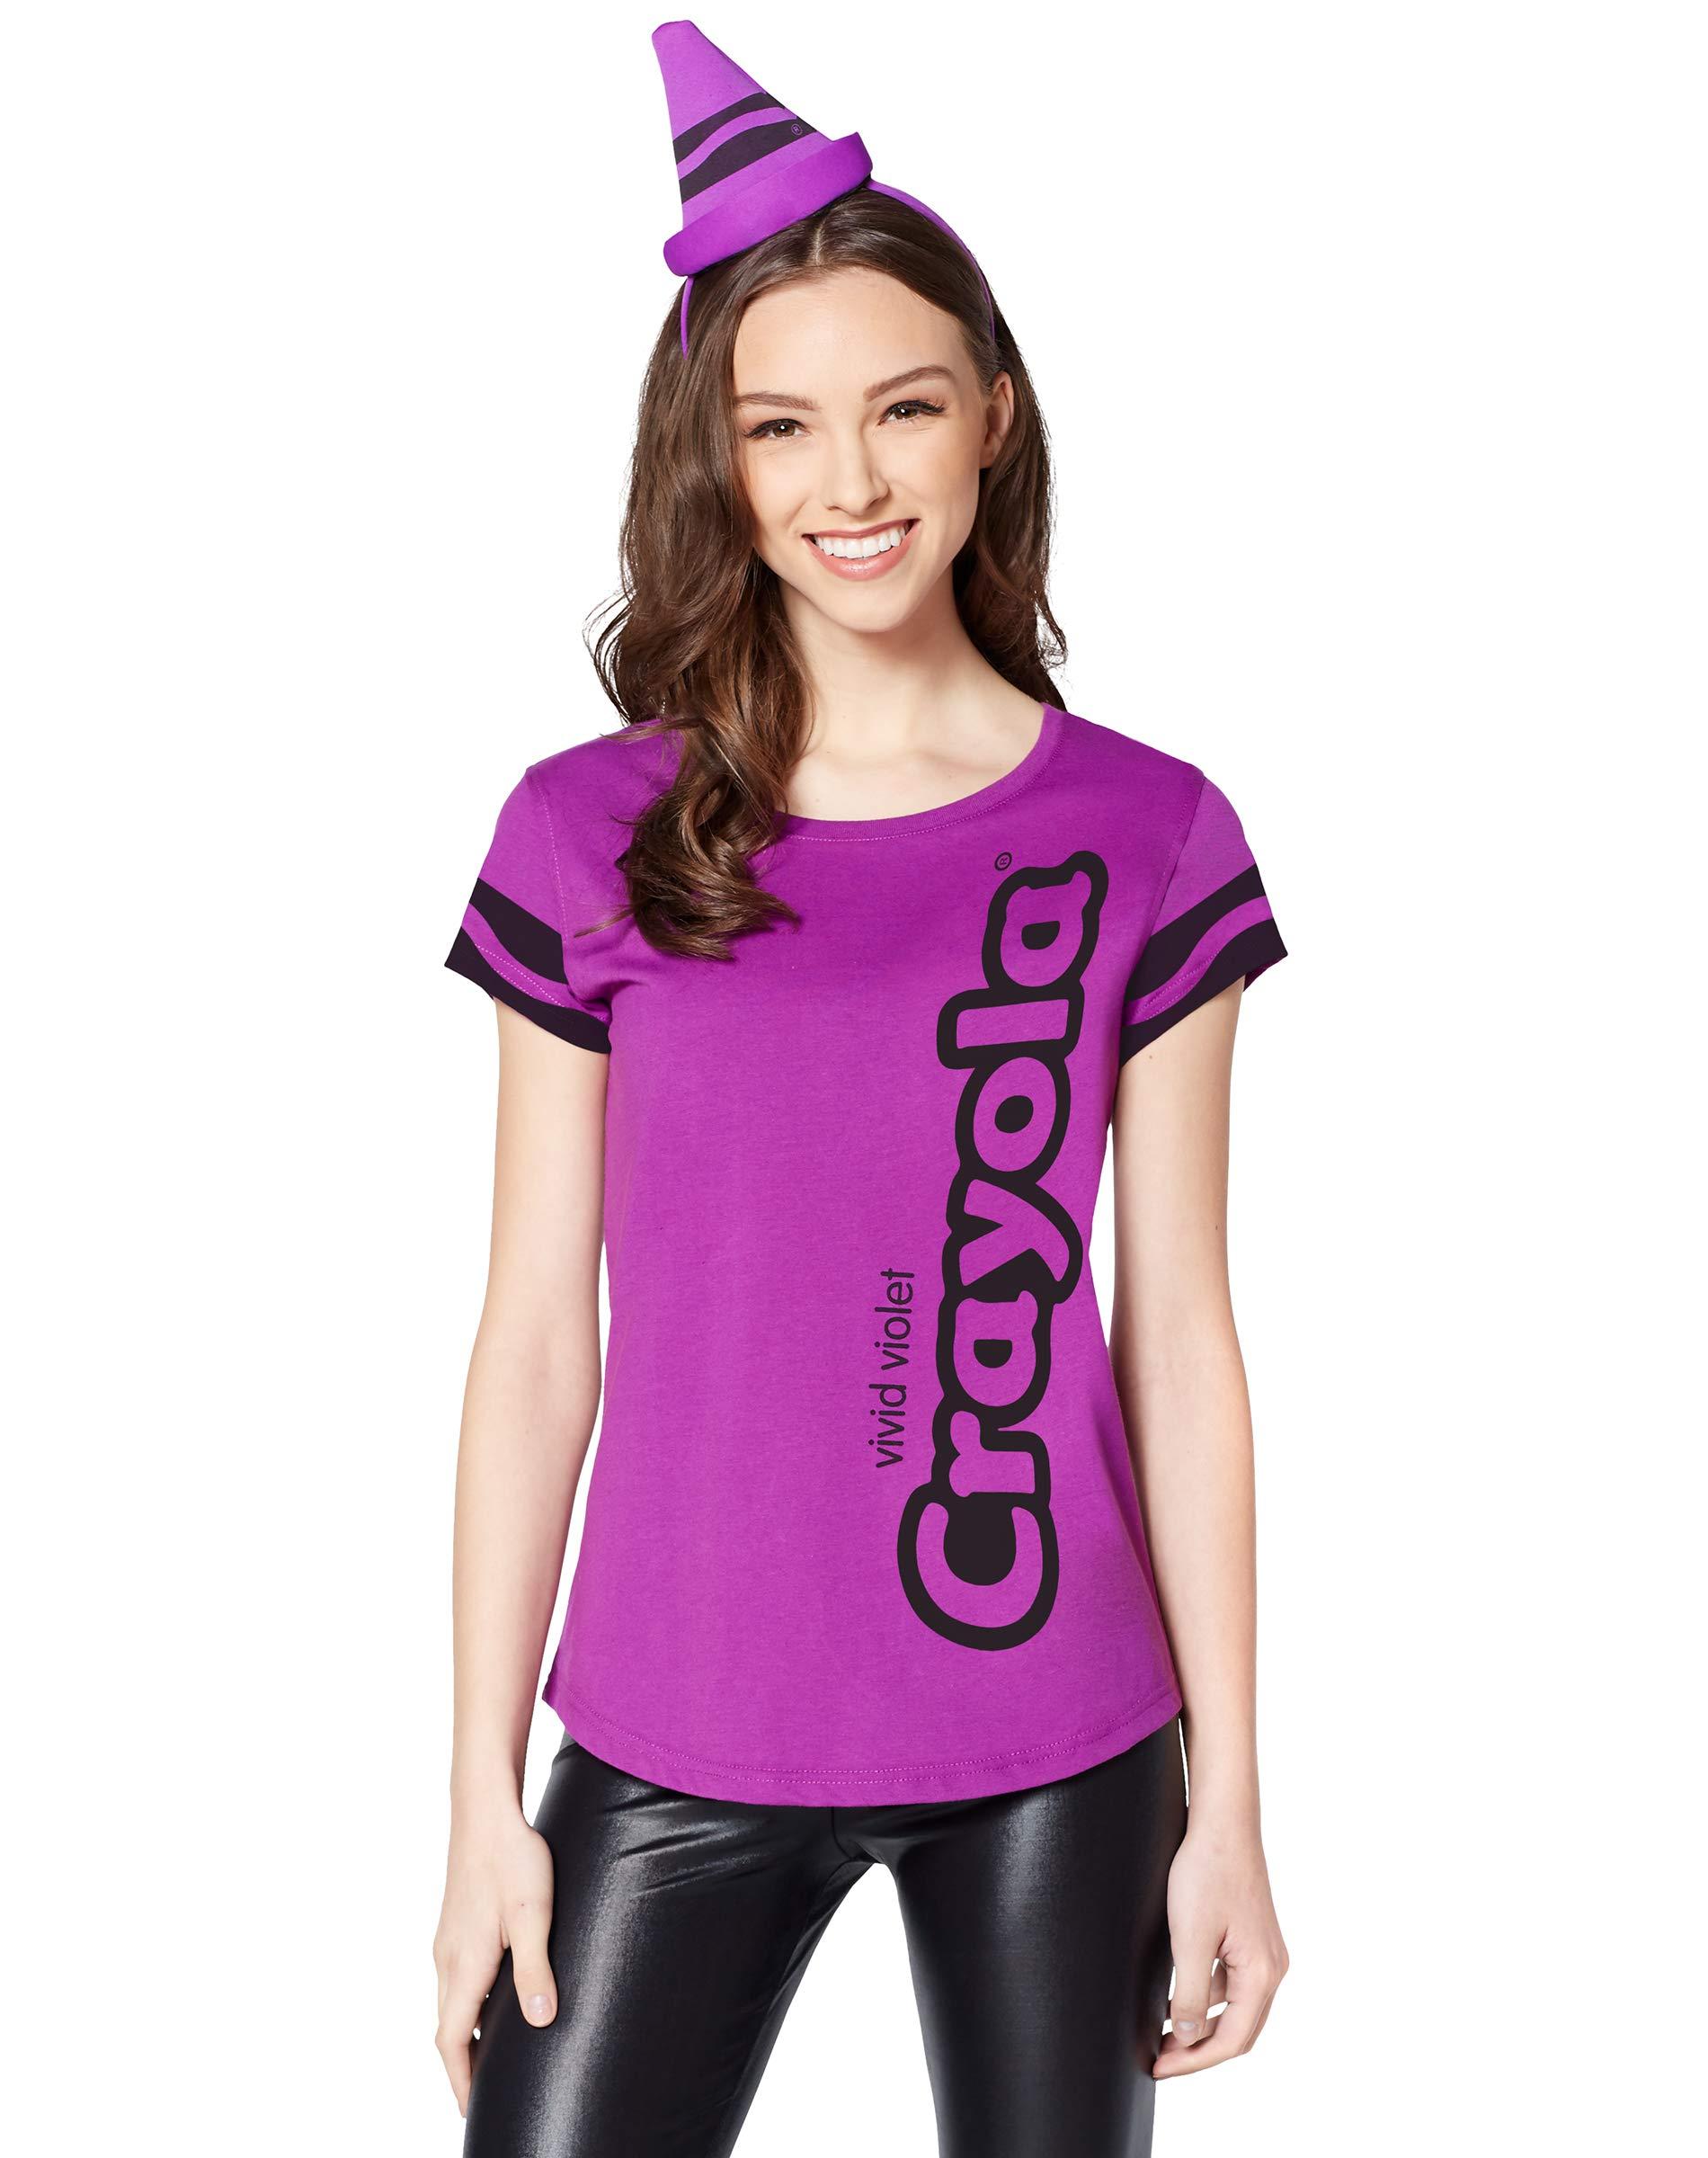 Spirit Halloween Adult Women's Vivid Violet Crayon Costume Kit - Crayola